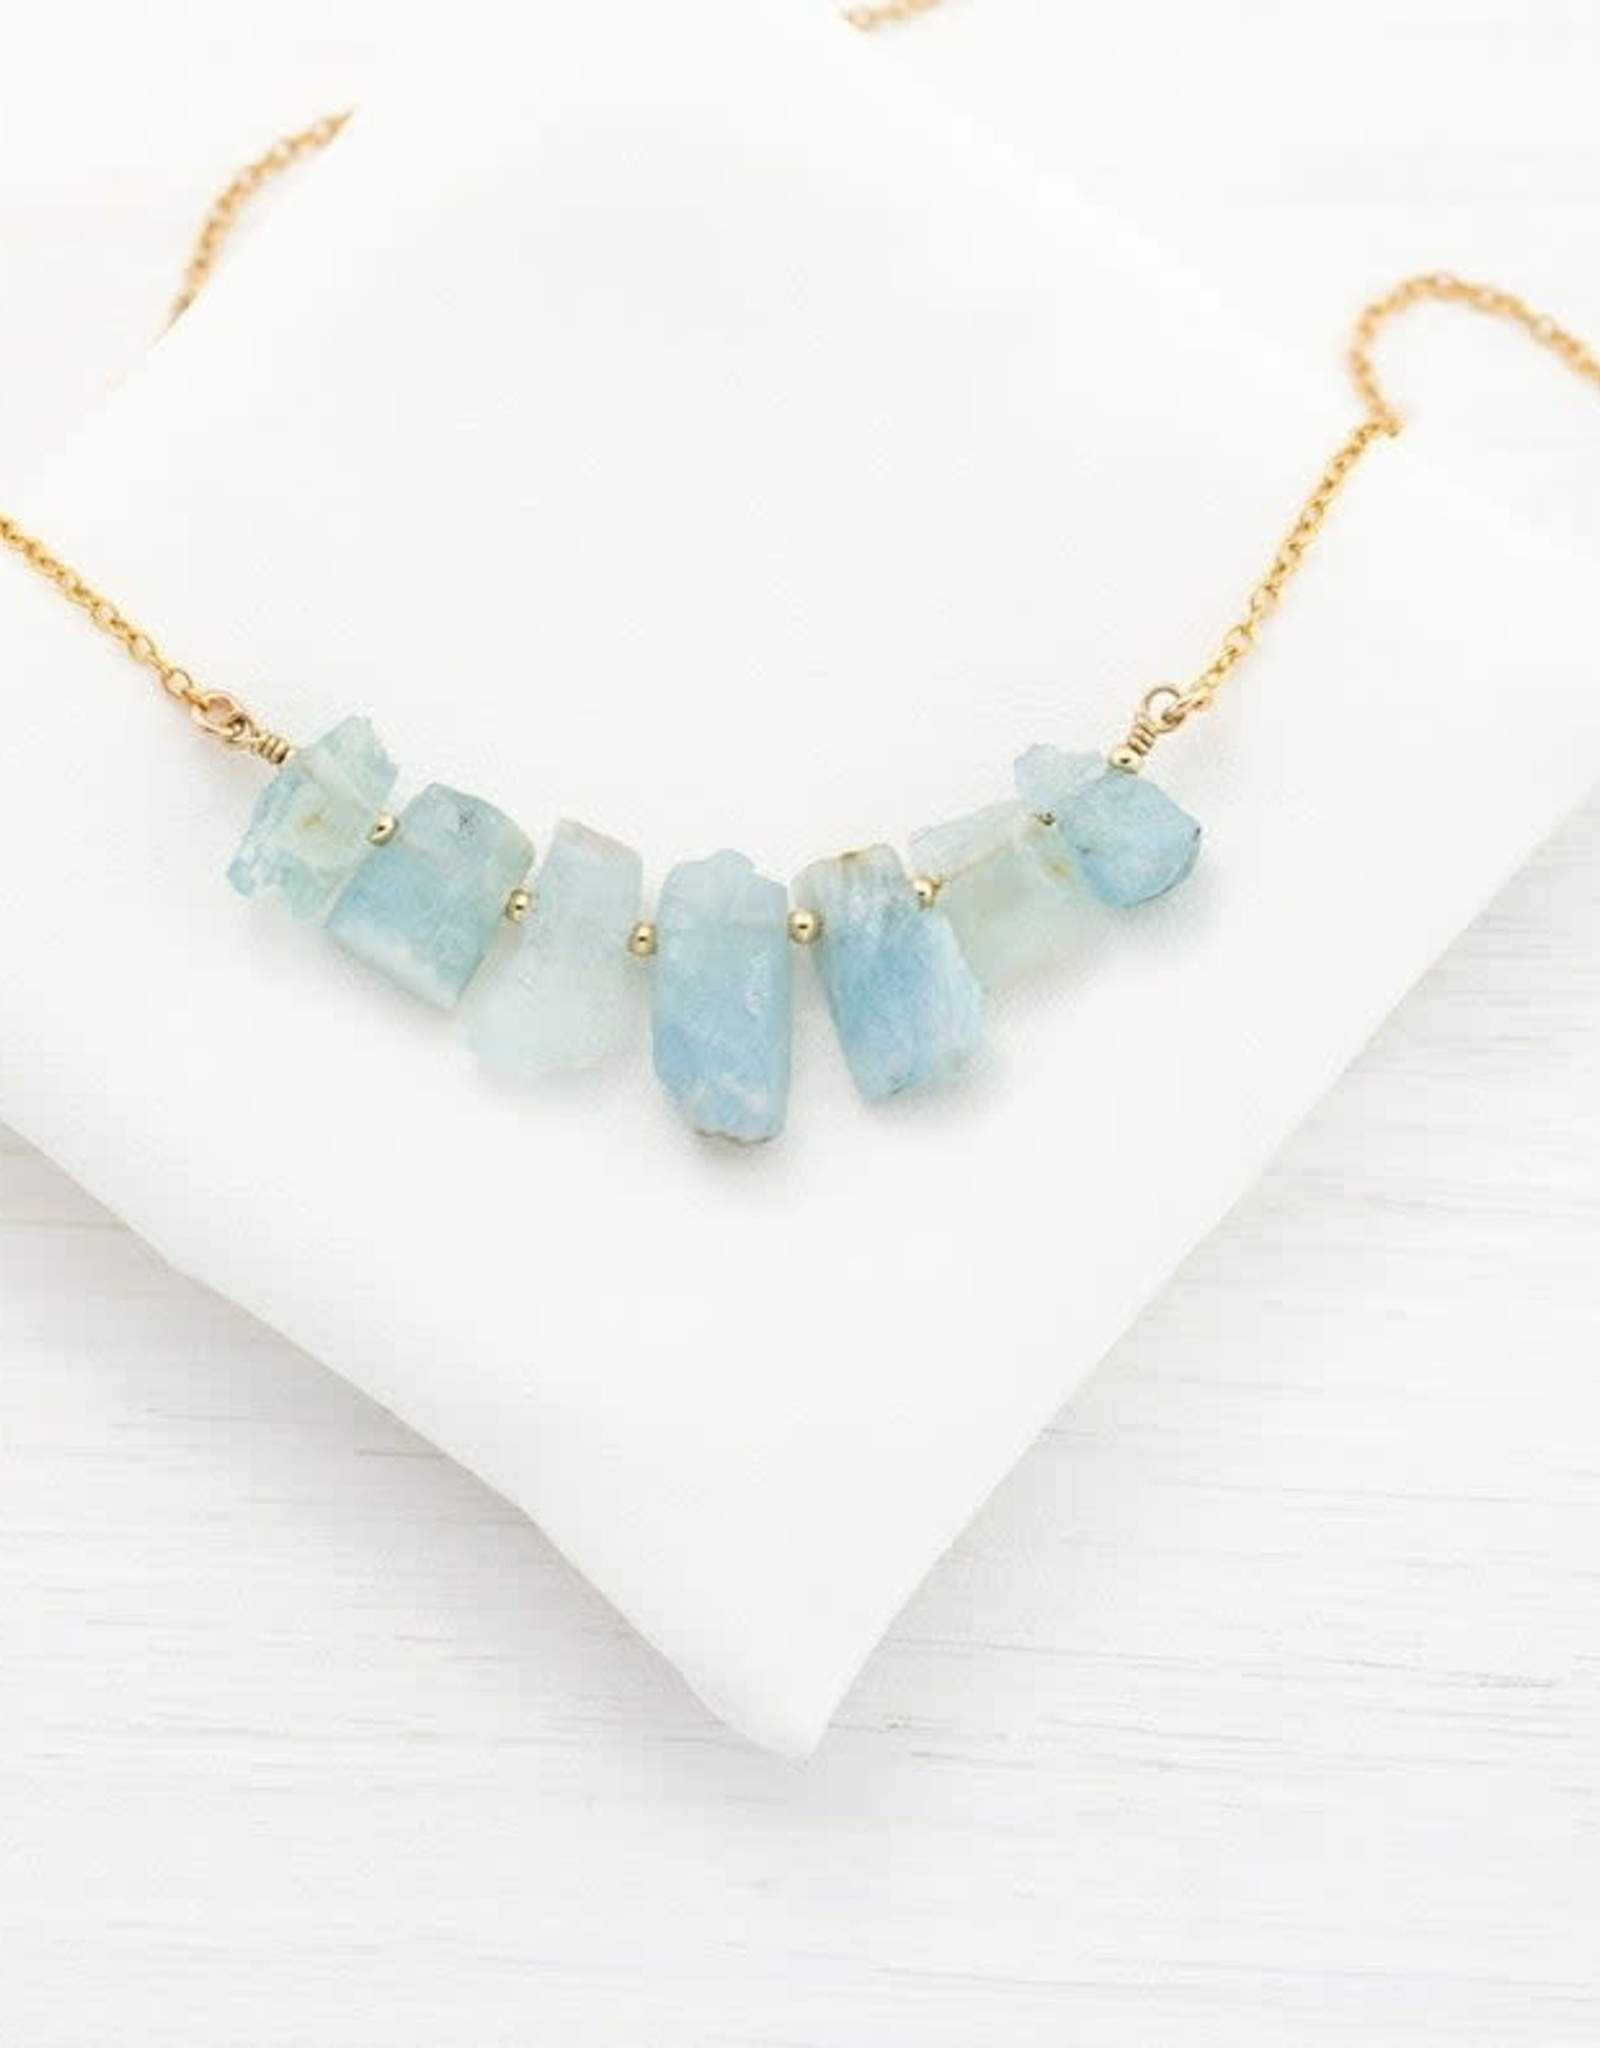 Raw Gemstone Necklace - Aquamarine Five Stone